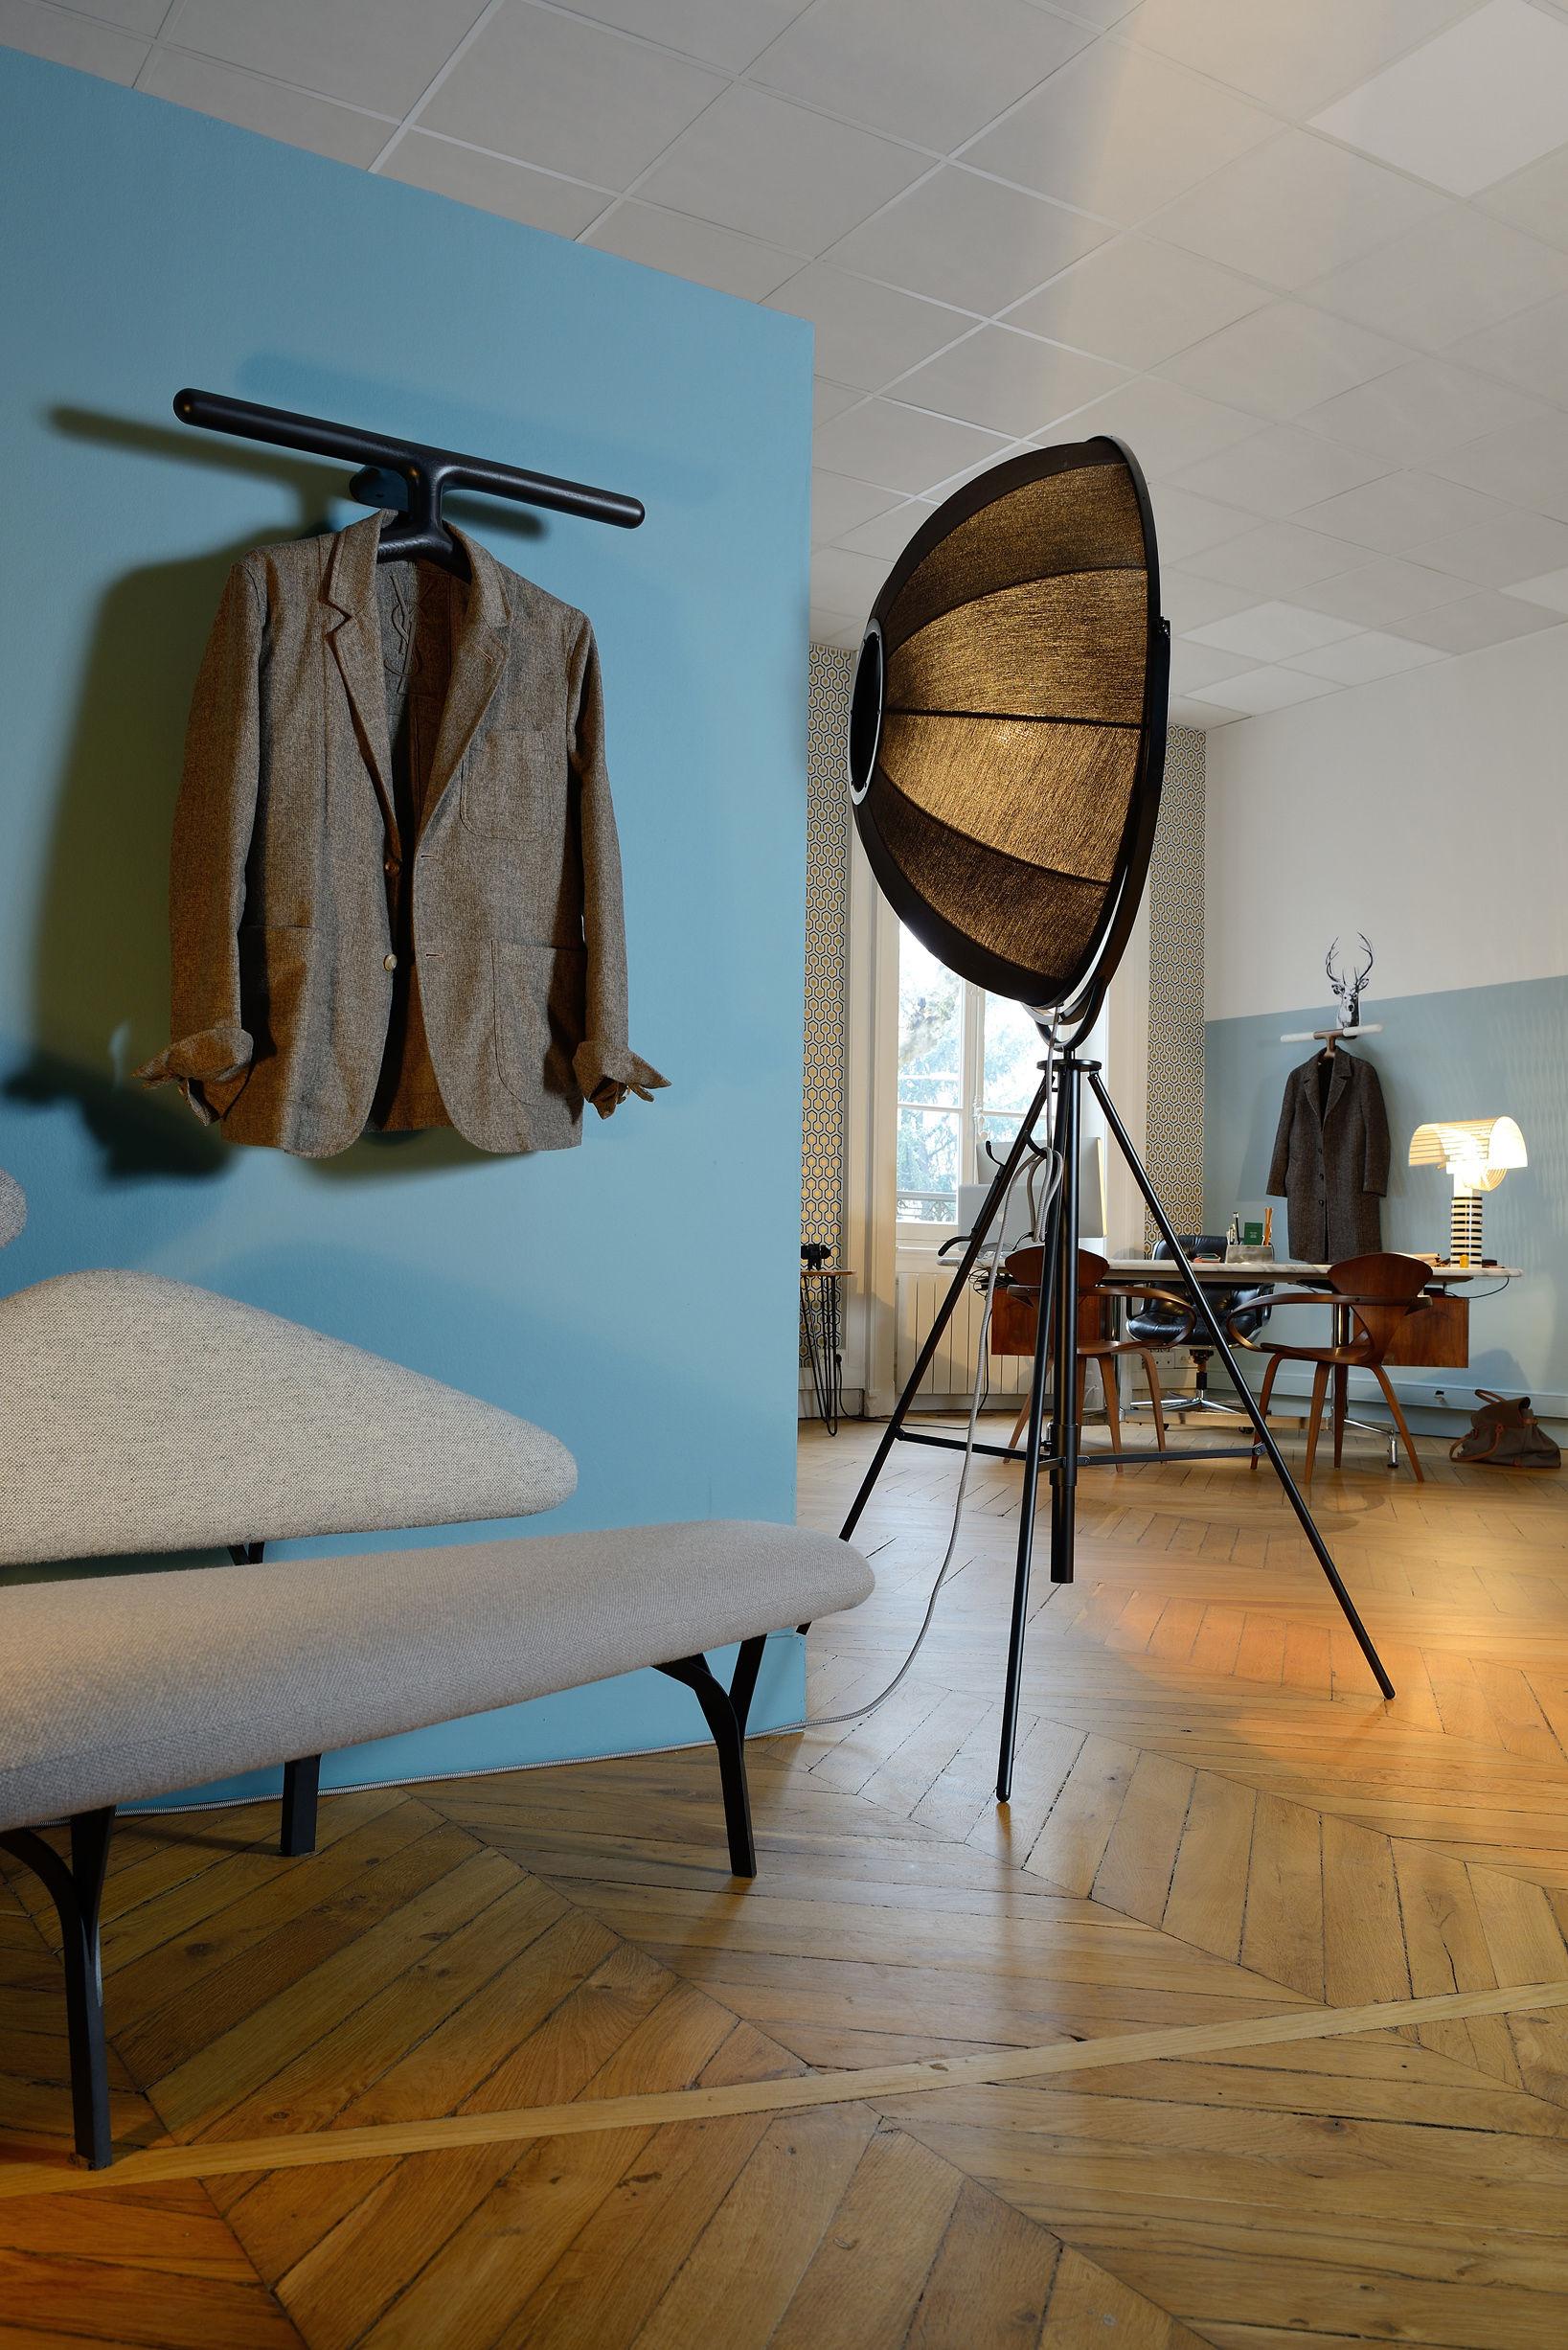 Jeeves / Garderobe L 62 cm - Wandbefestigung  La Chance ...